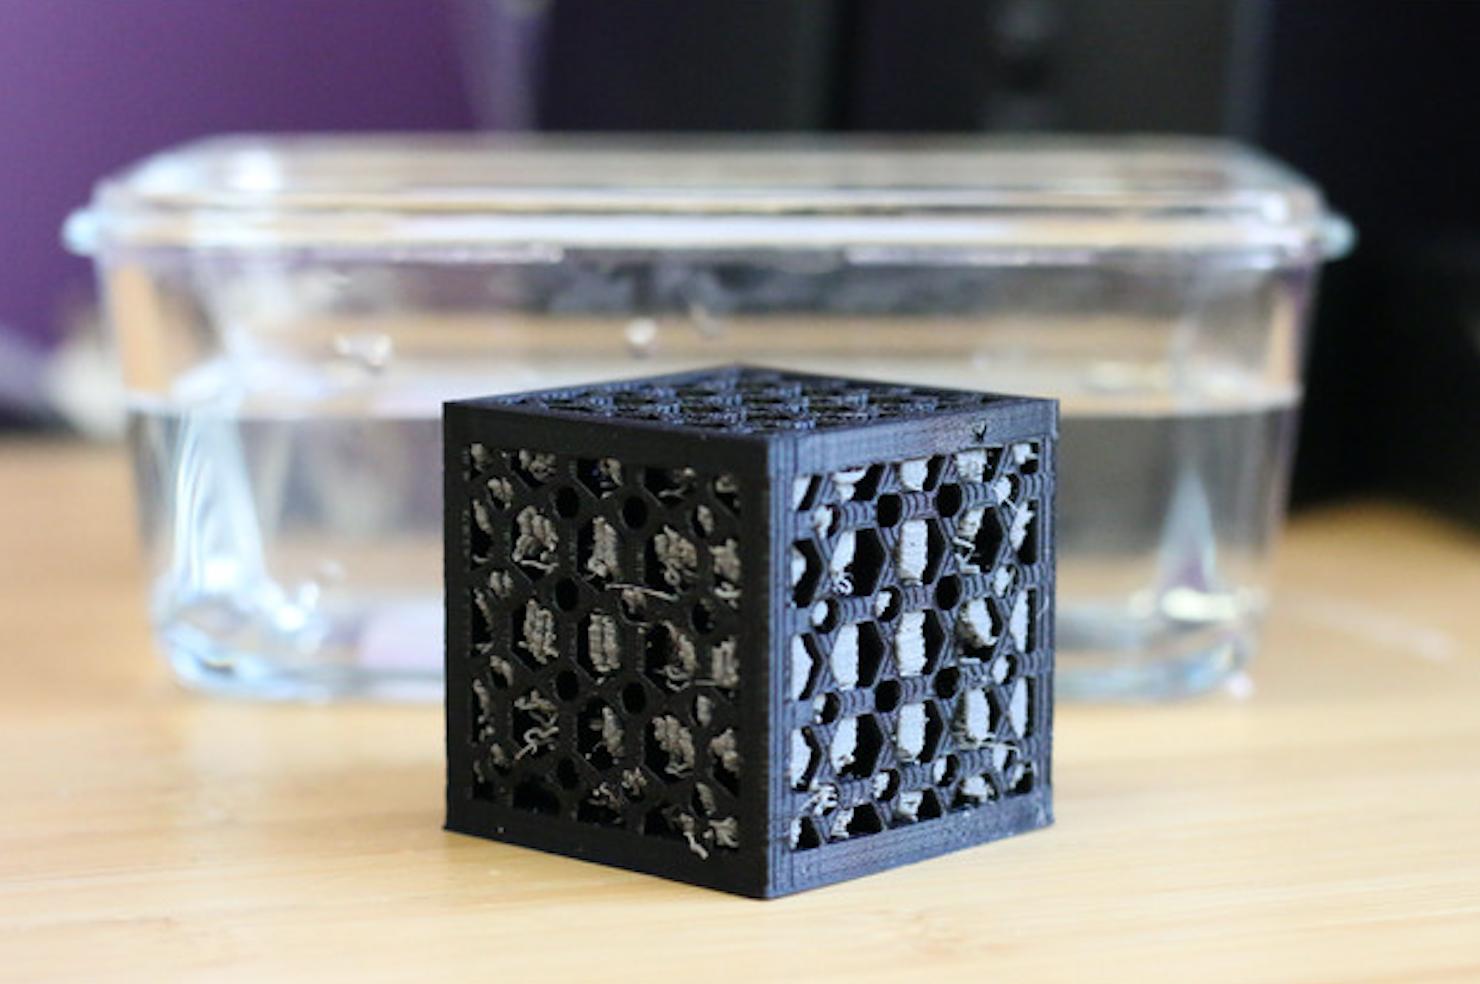 Capture d'écran 2017-07-03 à 12.52.20.png Download free STL file Multi-Color Ball in a Cube • 3D printer model, MosaicManufacturing